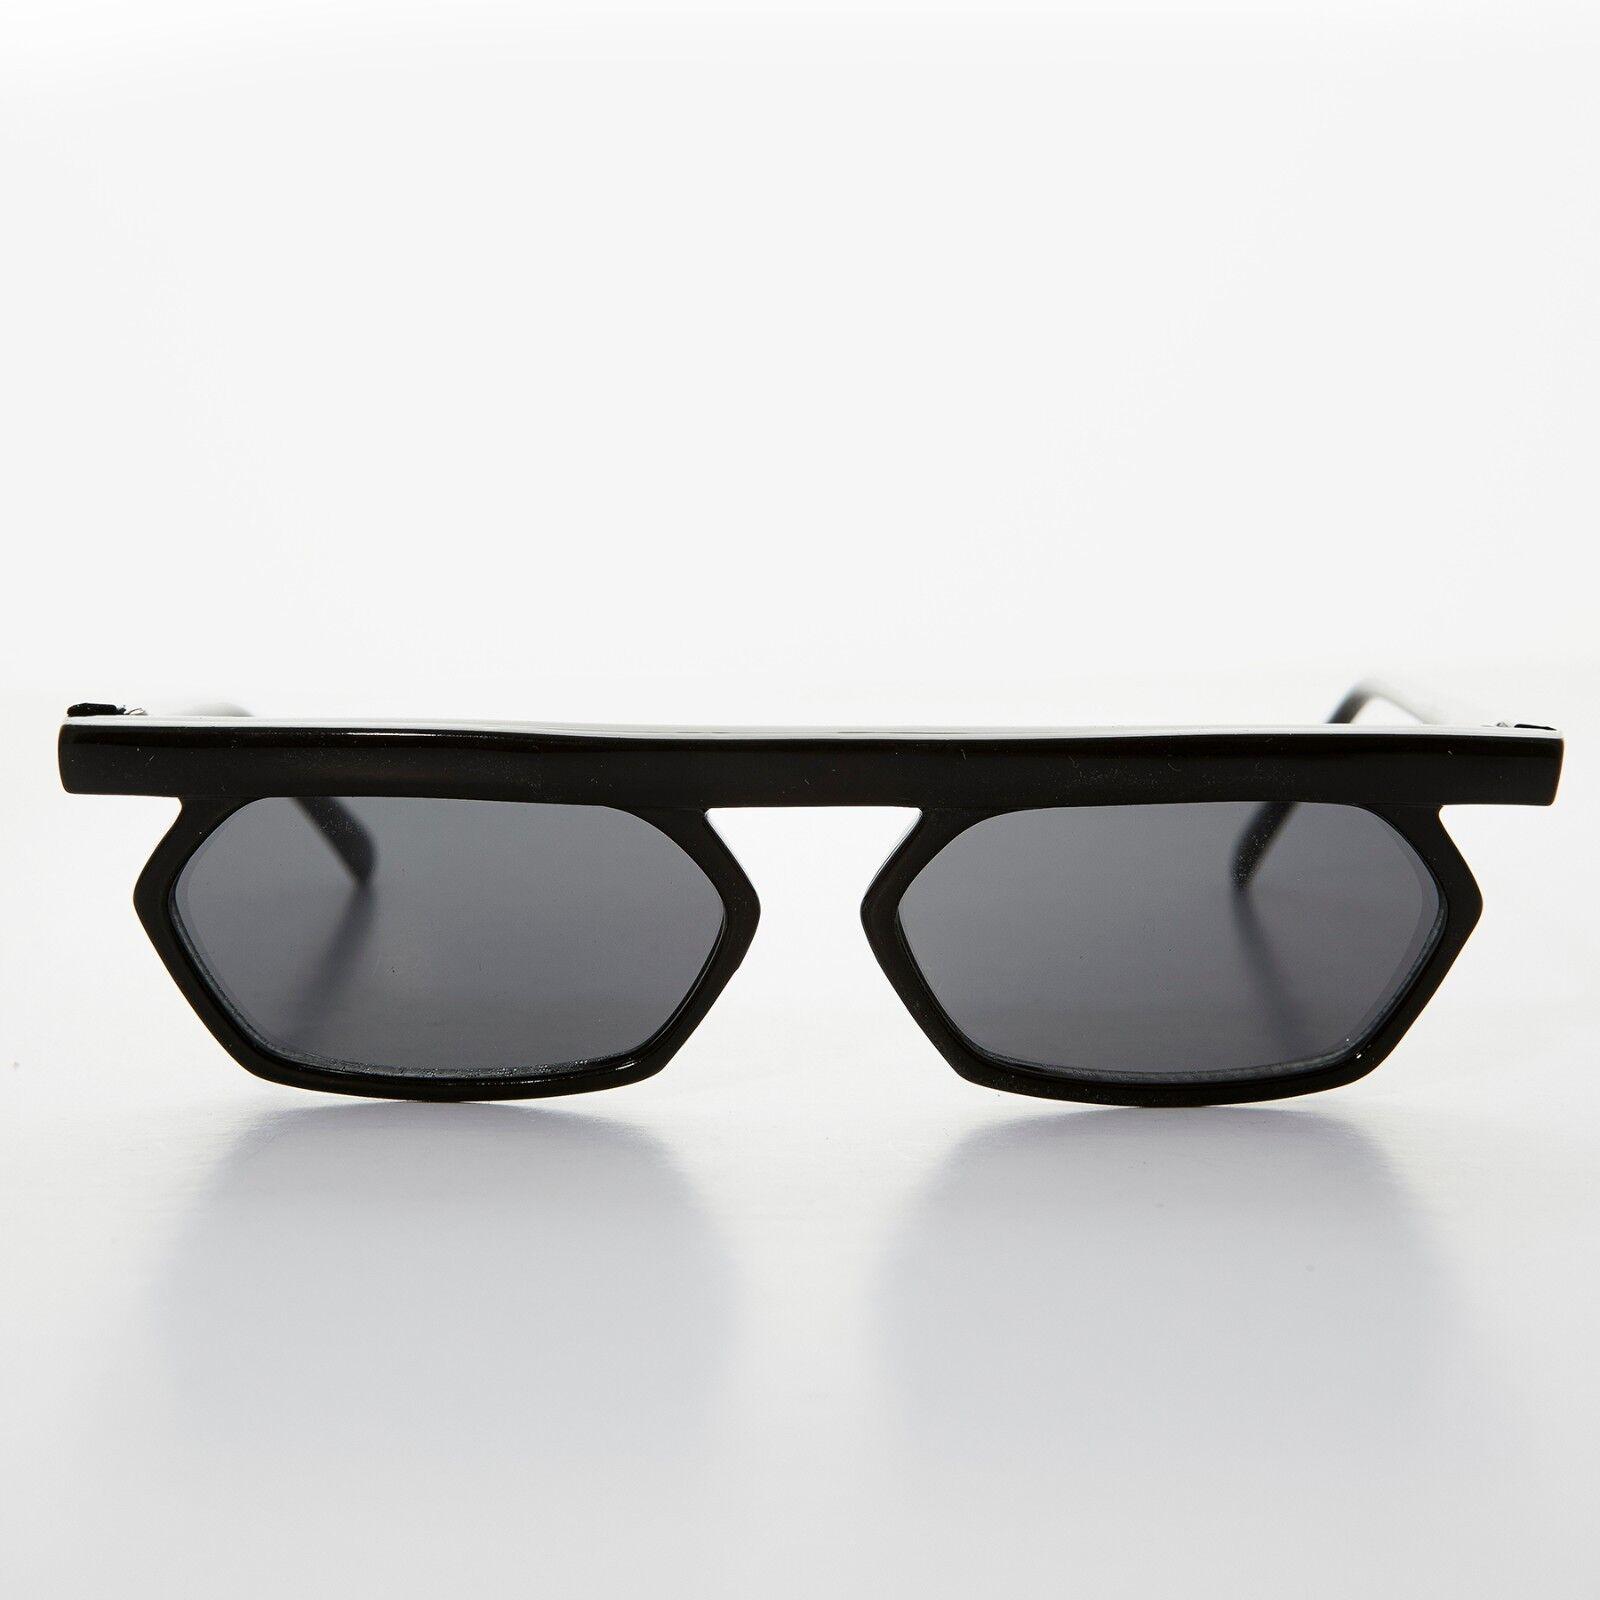 Matrix Neo Style Vintage Steampunk Sunglass Black/Gray -Lestor